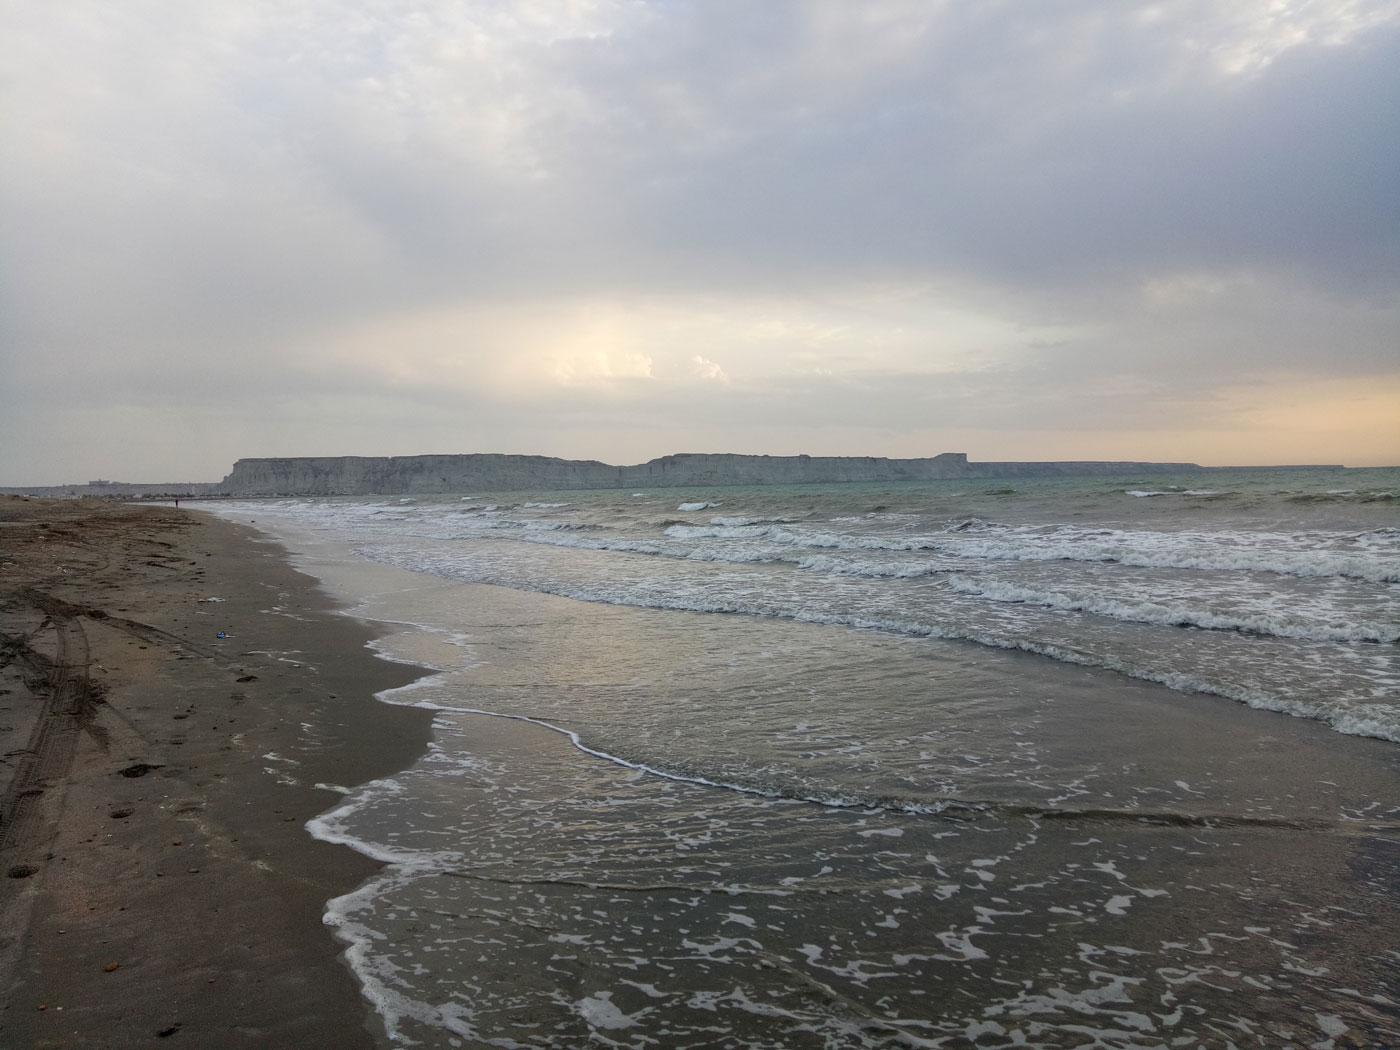 20 Acer Open Land Sea Front In Mouza Gunz, Gwadar